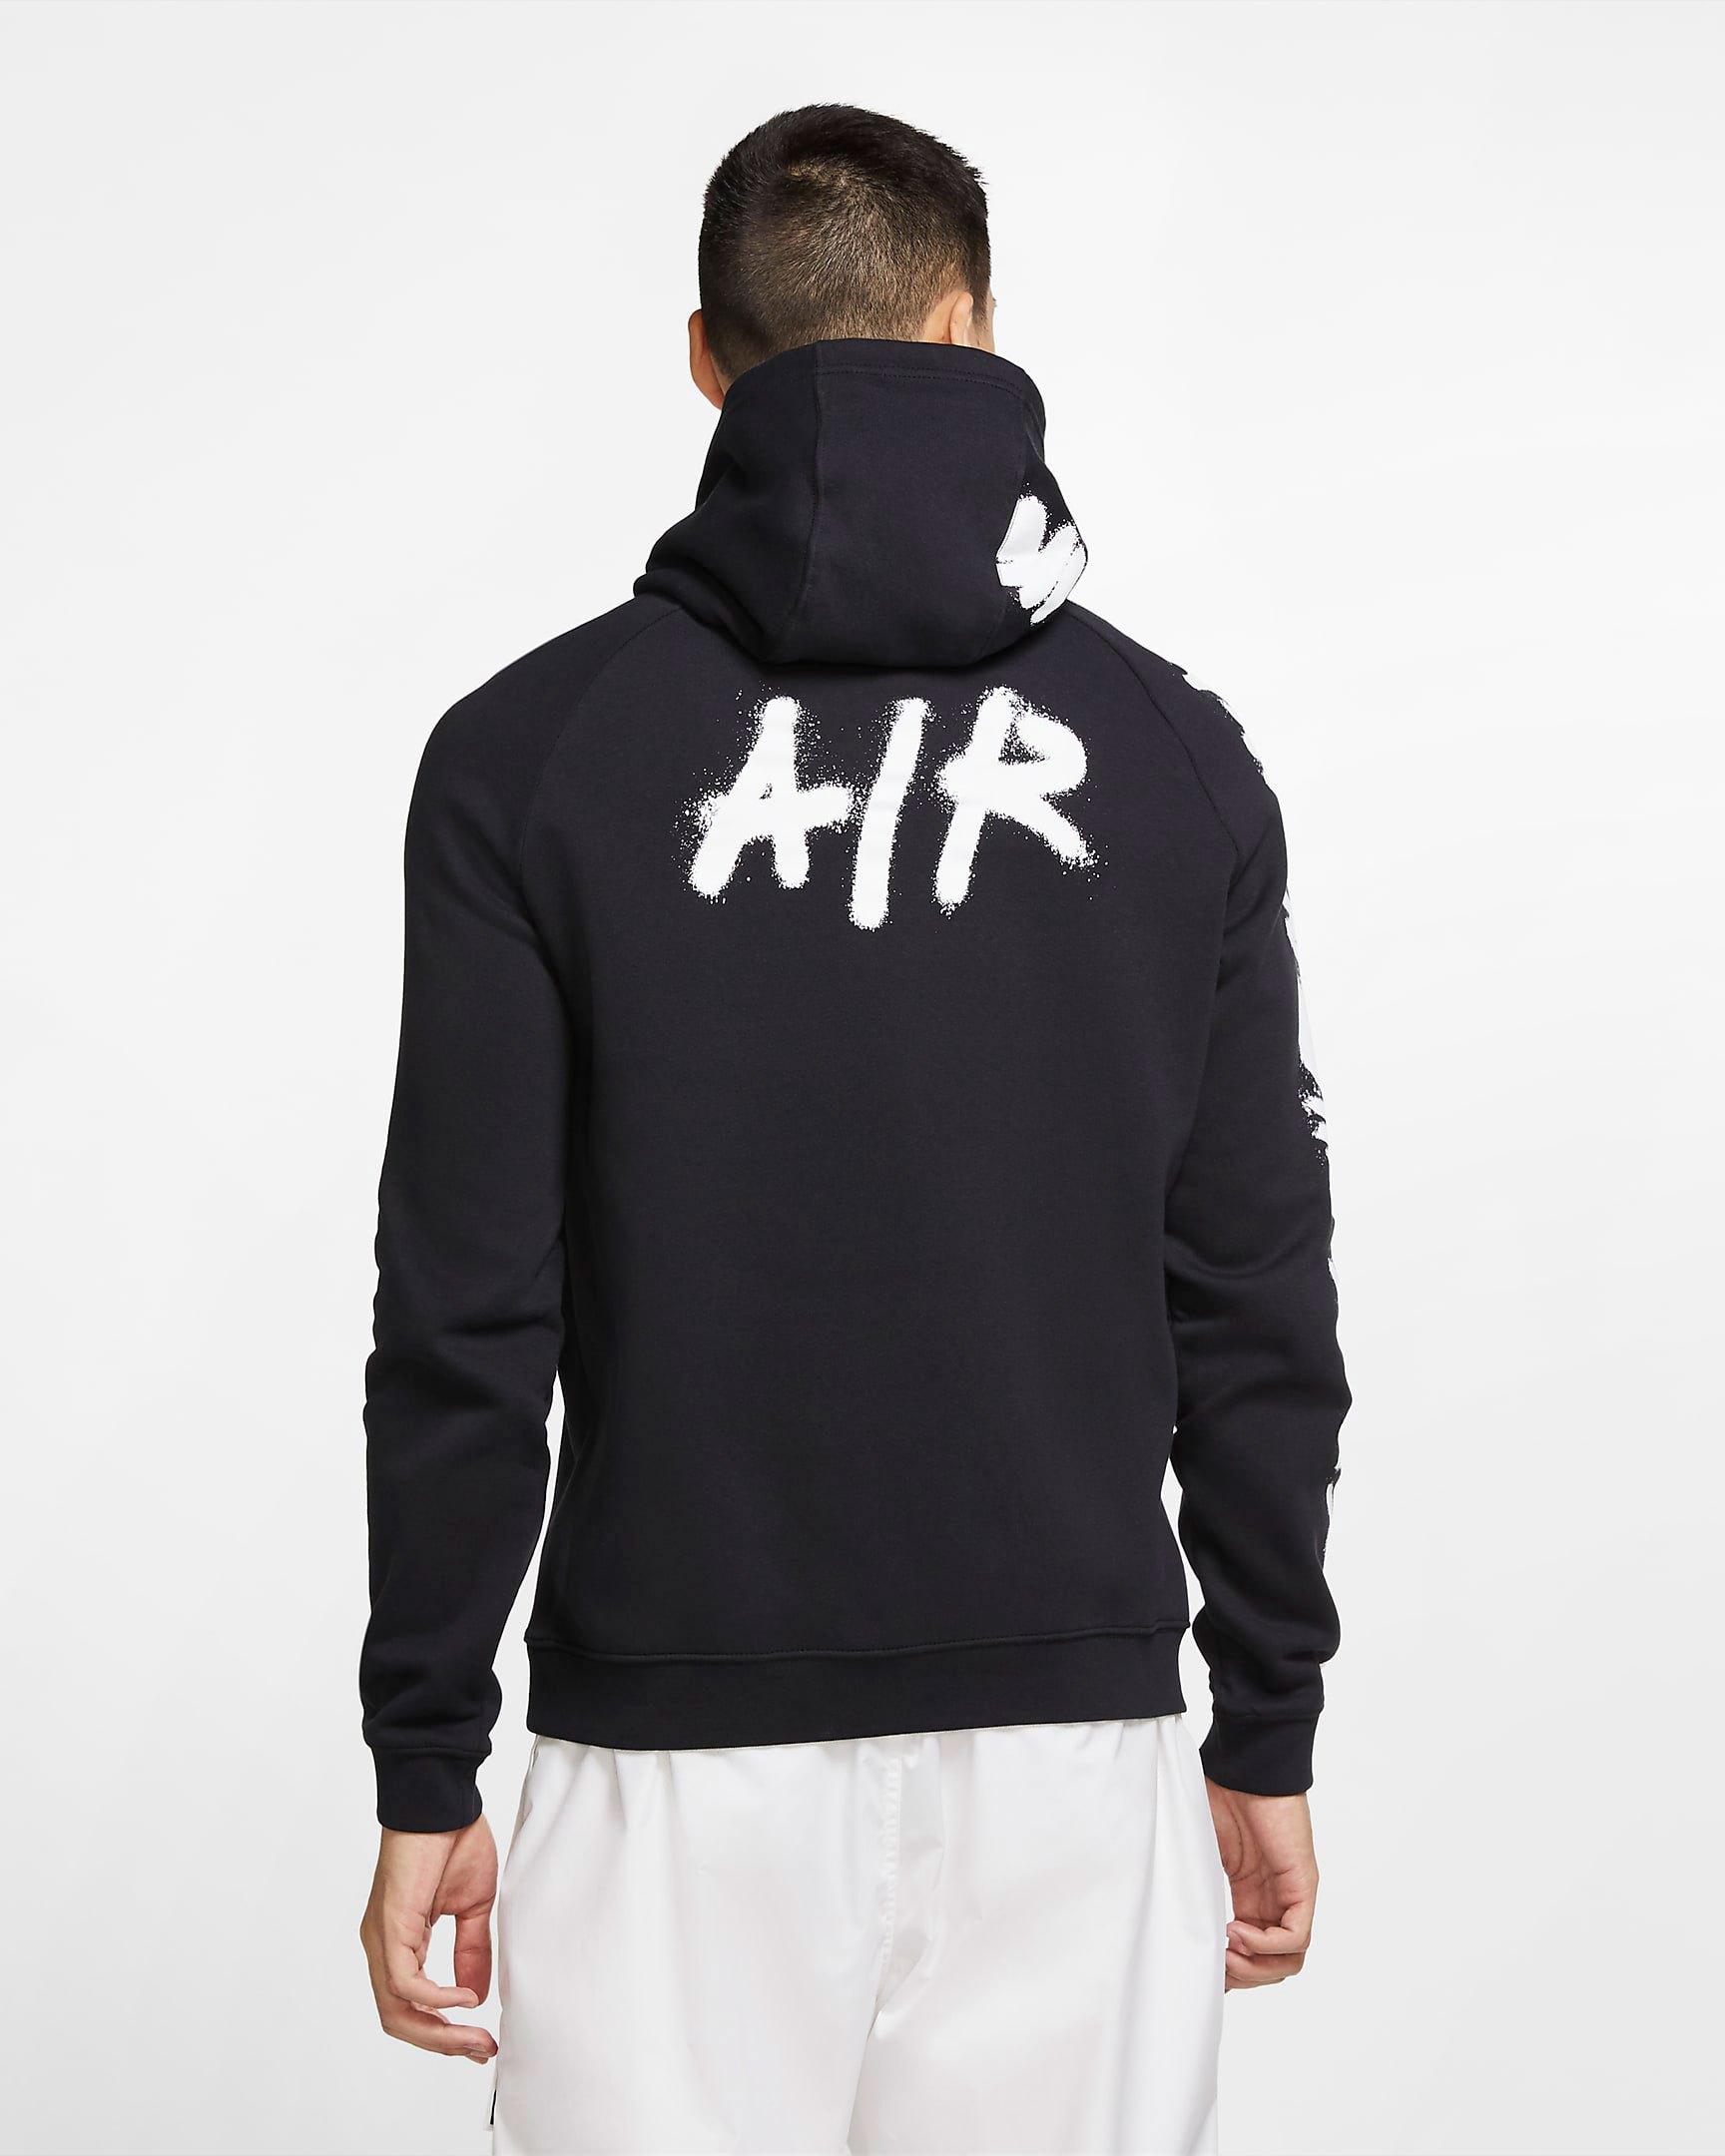 nike-sportswear-spray-paint-club-hoodie-black-5